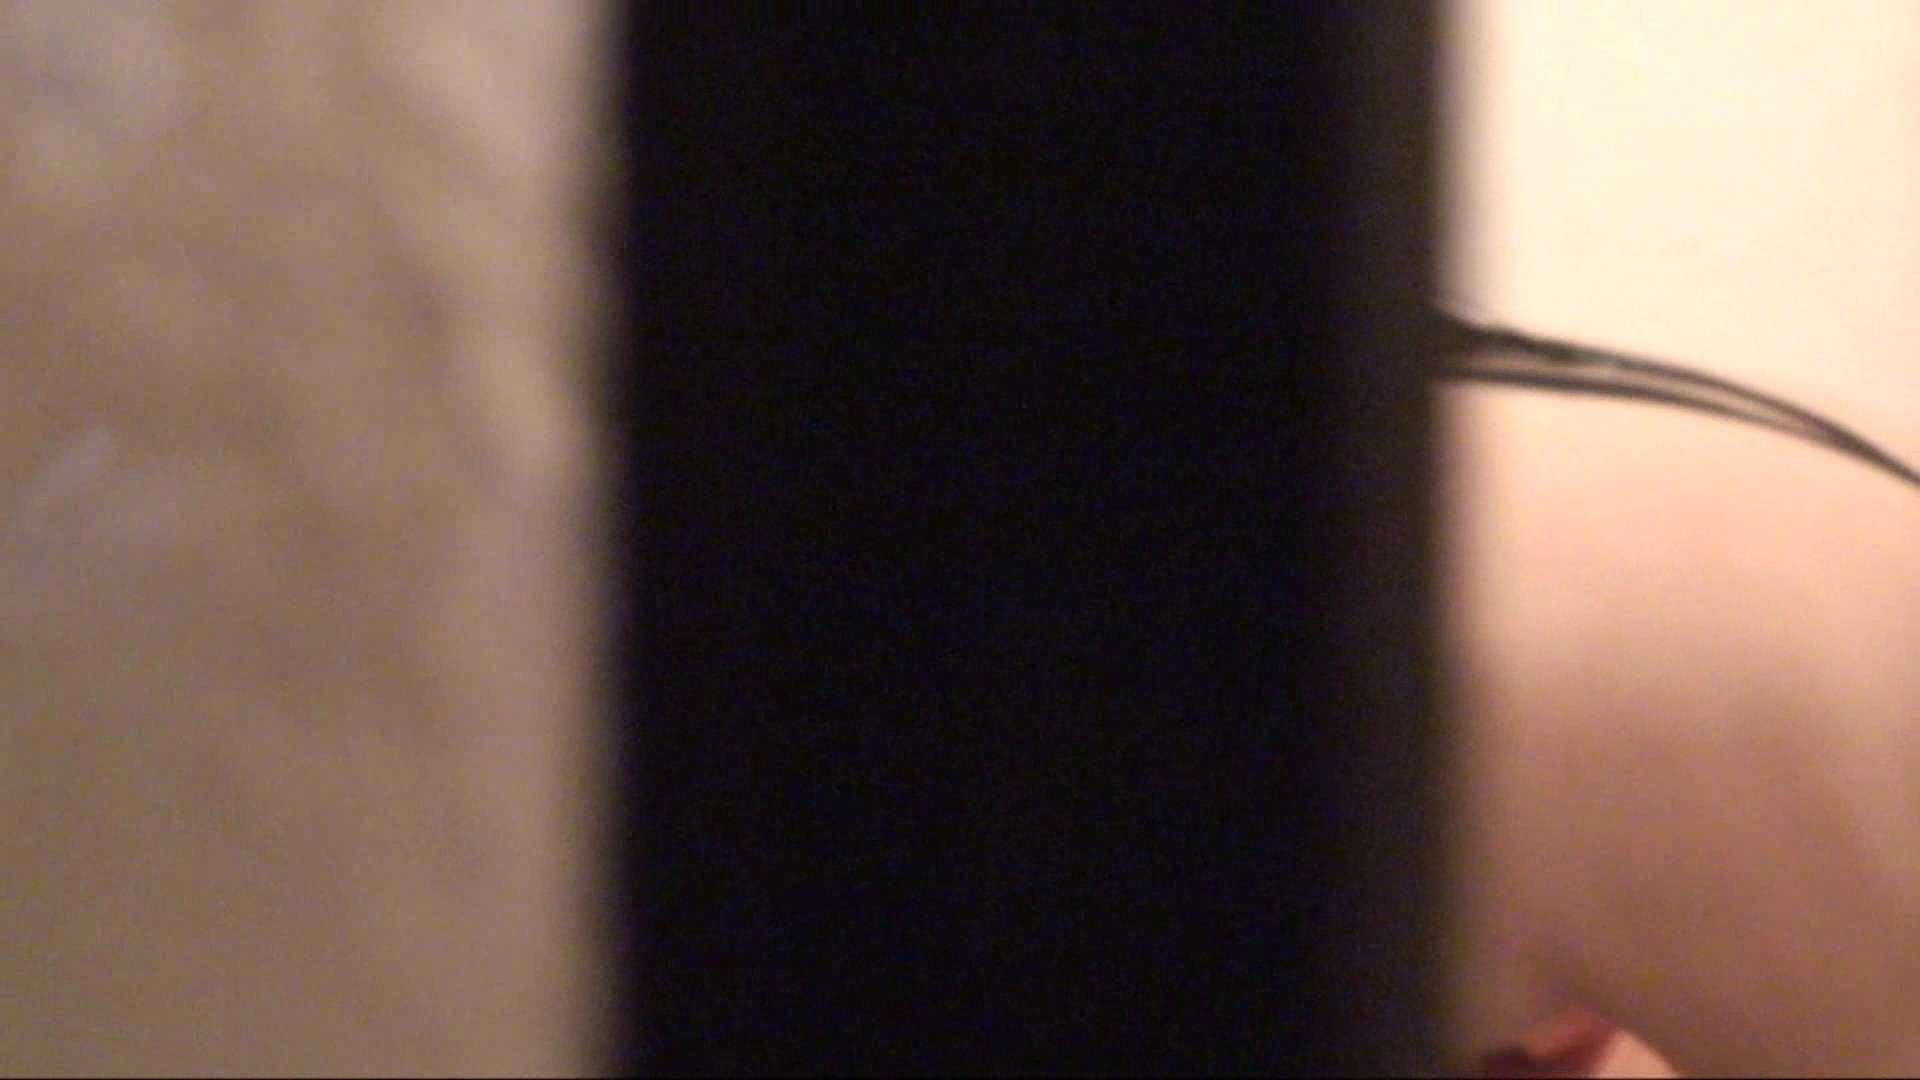 vol.01必見!白肌嬢の乳首が丸見え。極上美人のすっぴん顔をハイビジョンで! ギャルの乳首 AV無料動画キャプチャ 71画像 34